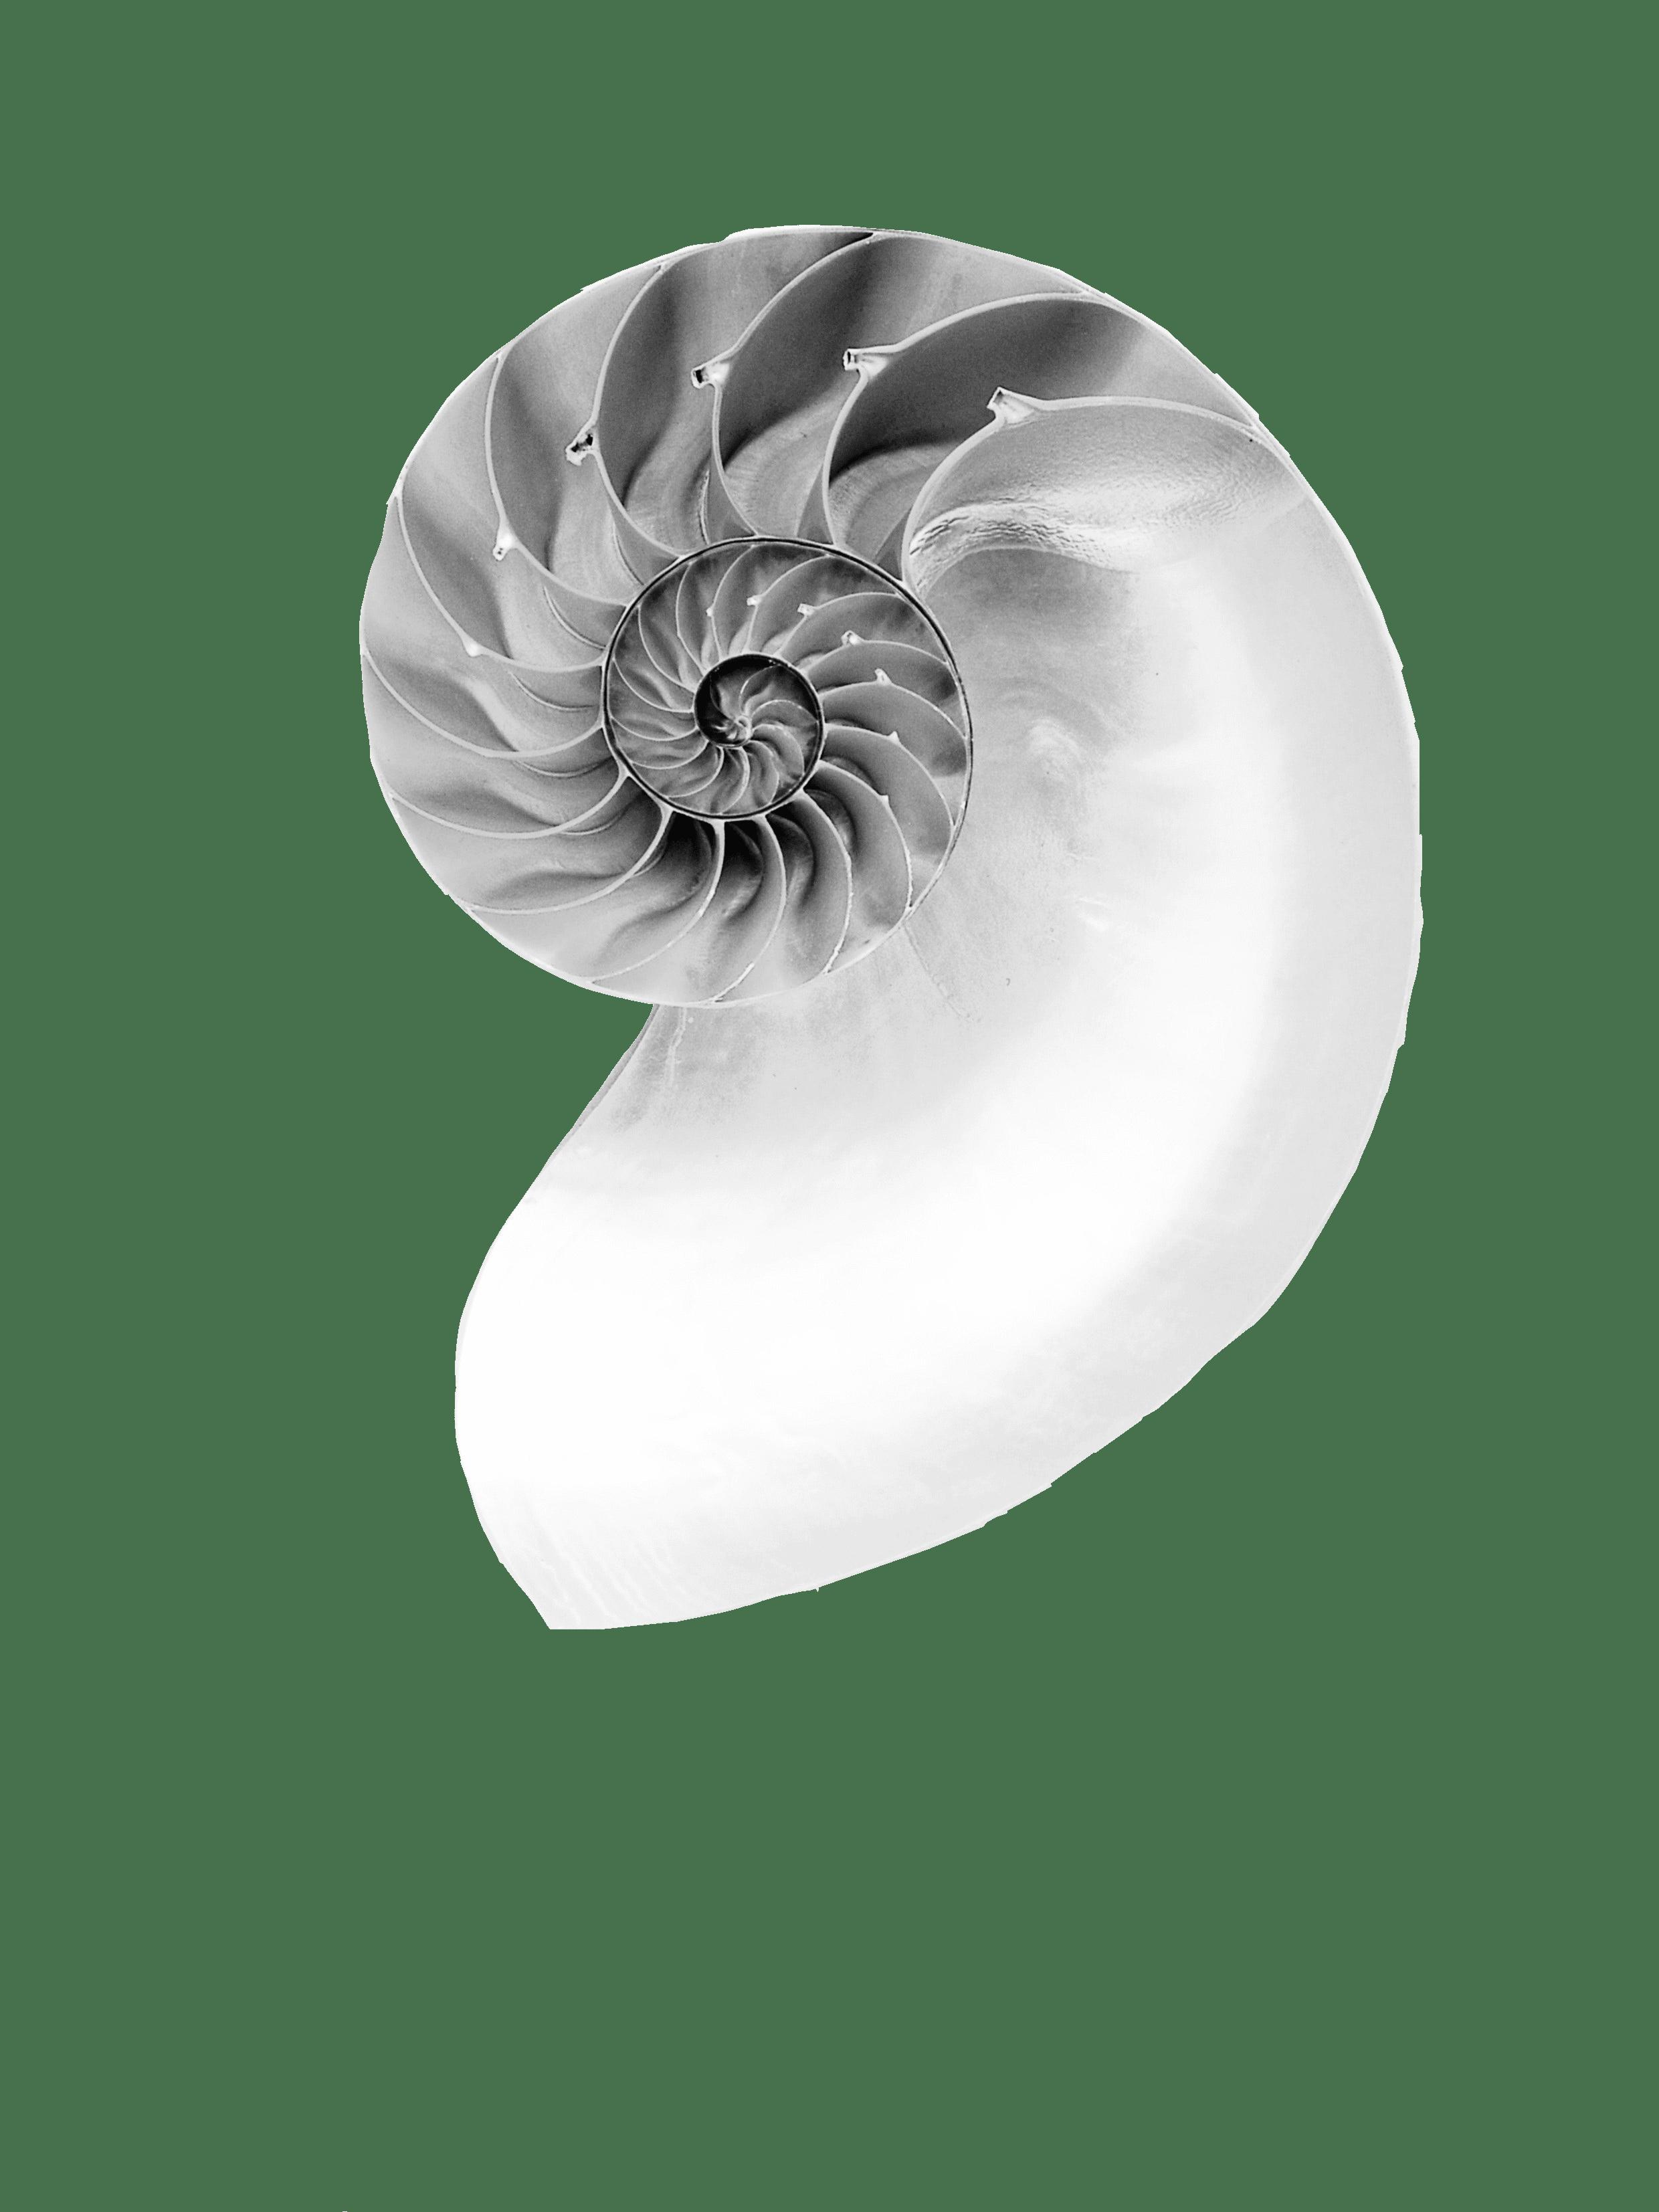 A circular mollusc - Responsible Business Awards 2020 - Connected Places award